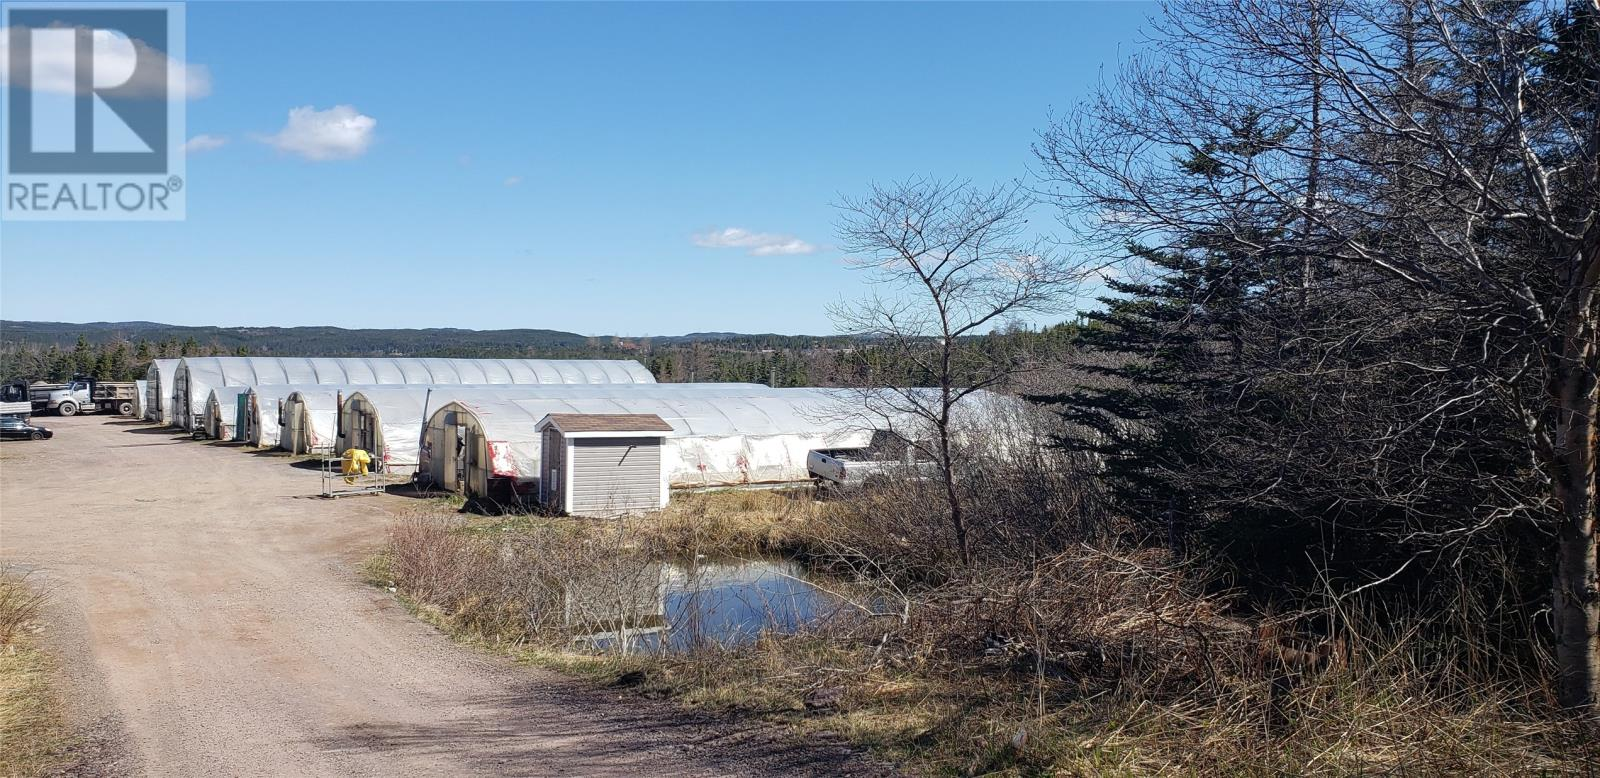 669 Creston Boulevard, Marystown, Newfoundland & Labrador  A0E 2M0 - Photo 15 - 1229607